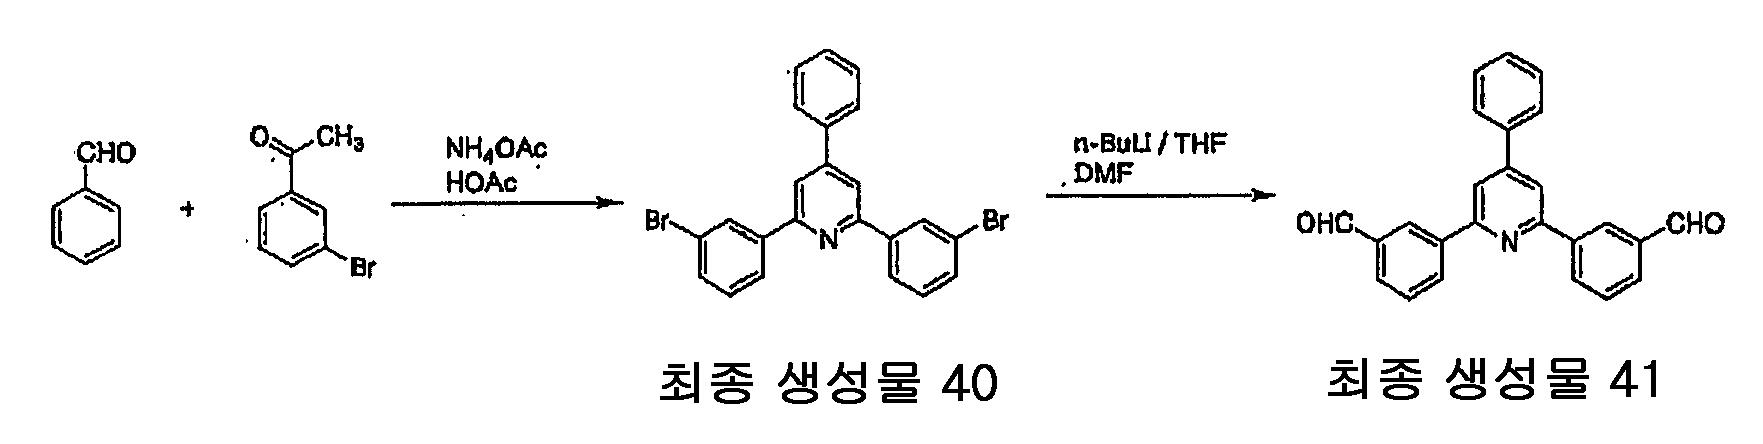 Figure 112010002231902-pat00131